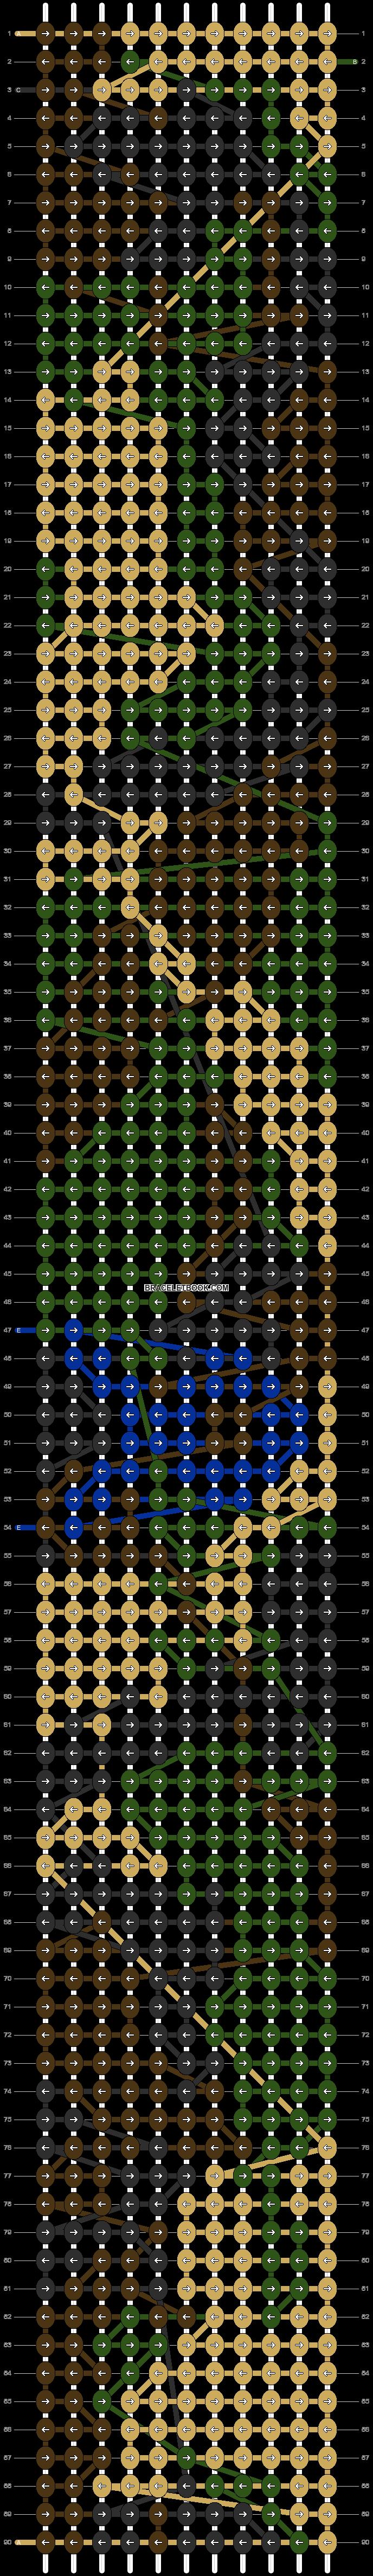 Alpha pattern #13342 pattern